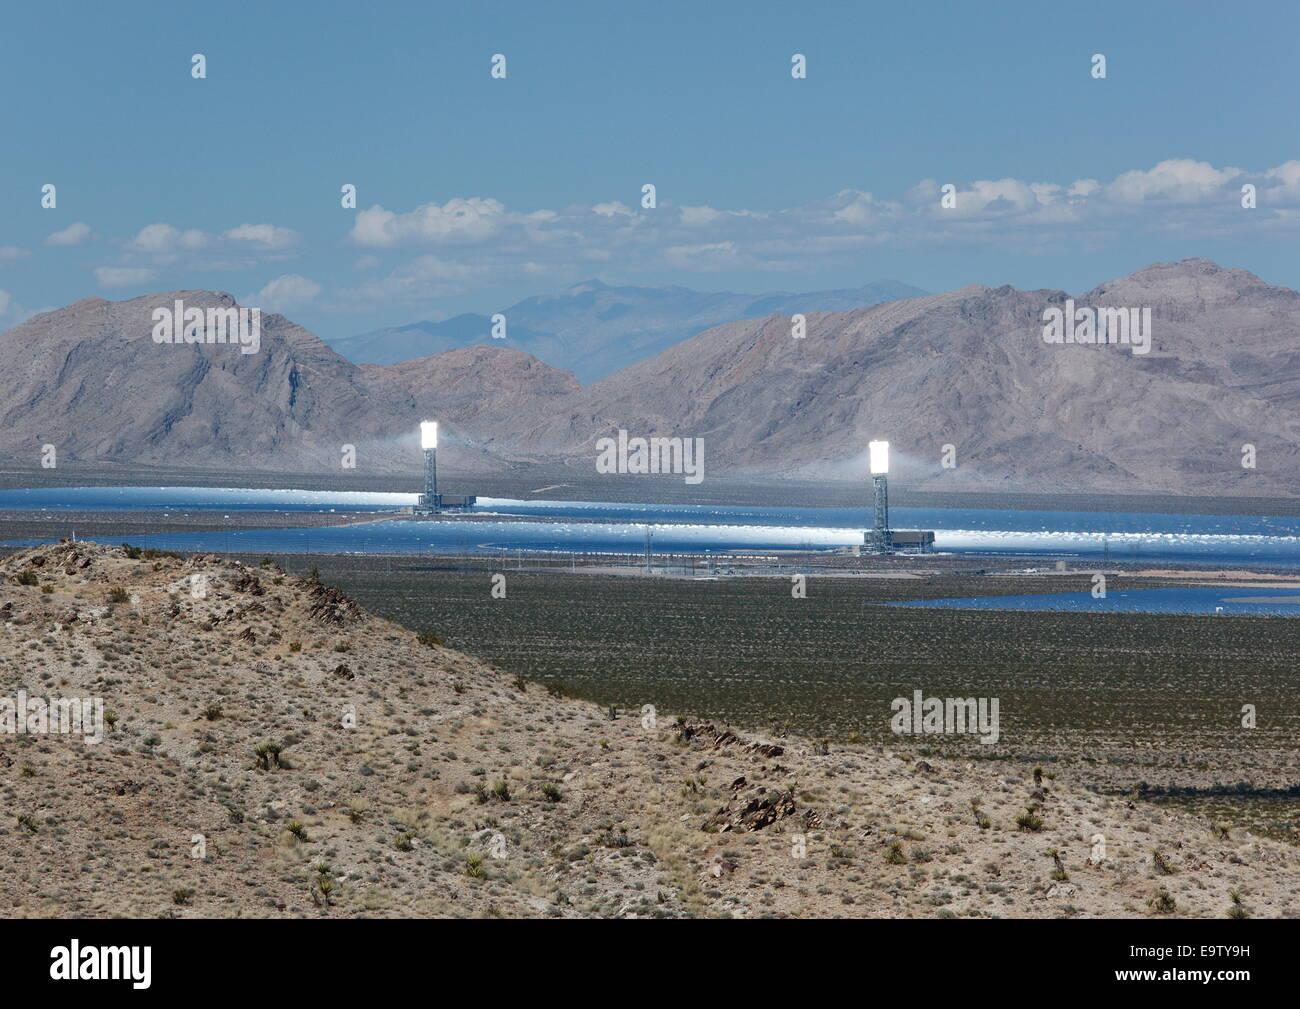 Ivanpah solar thermal energy project, near Primm, California, USA - Stock Image